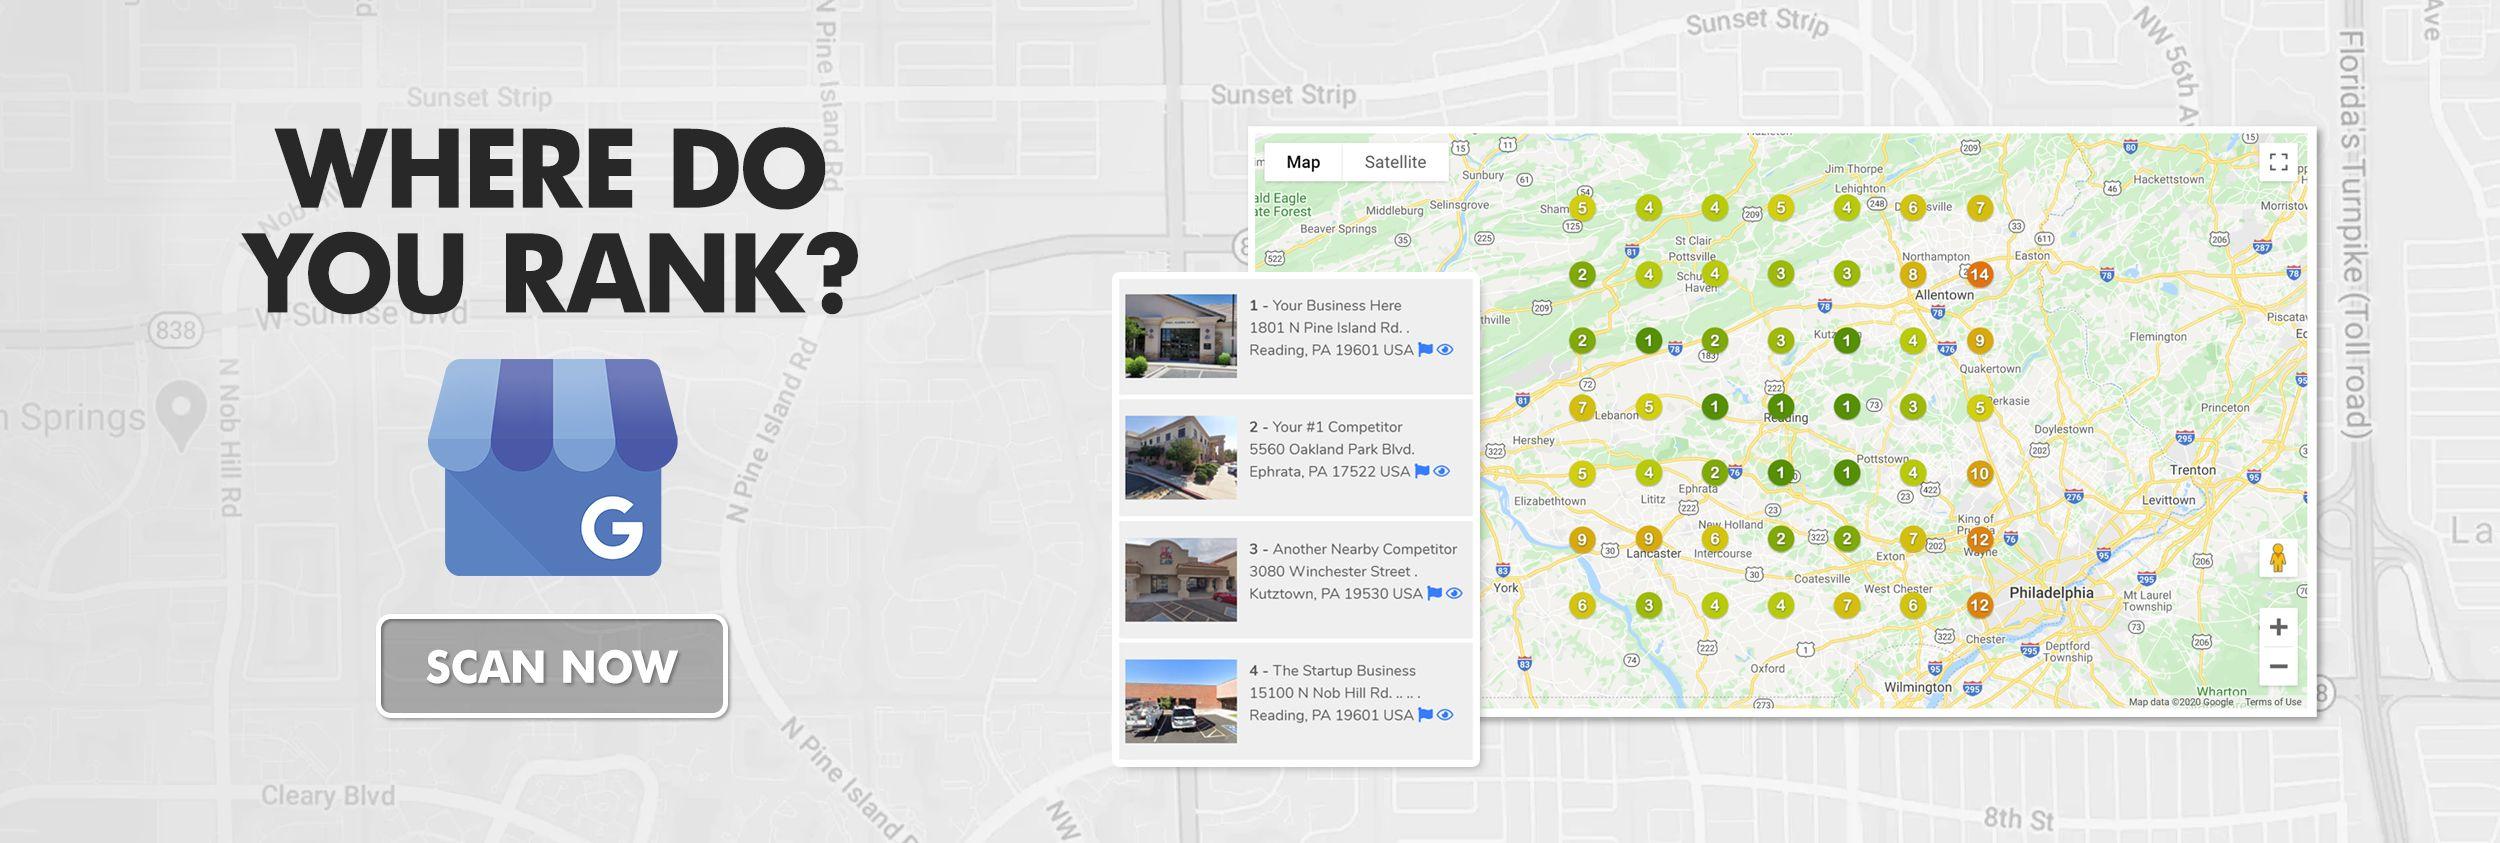 OMG Rank Grid - Where Do You Rank?